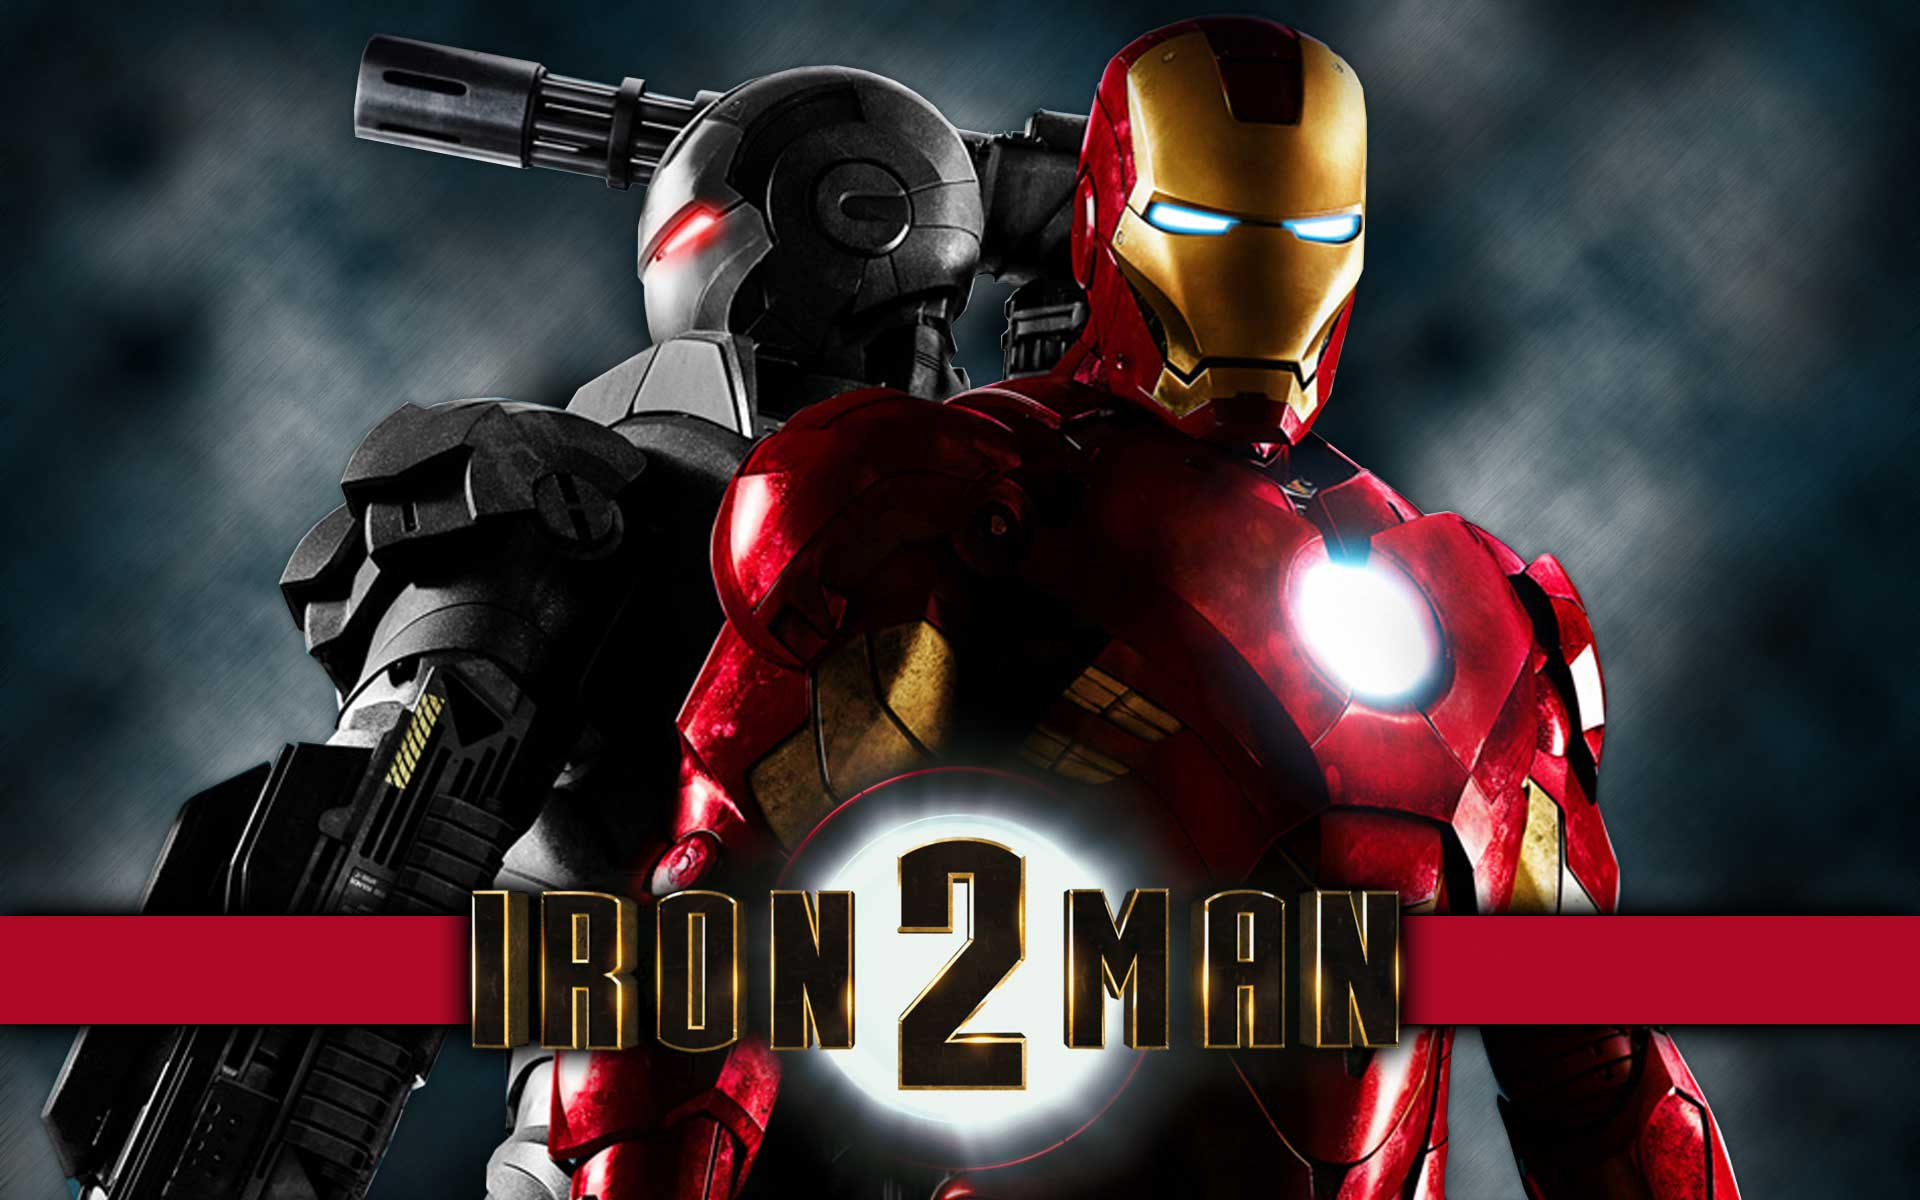 1920x1200 > Iron Man 2 Wallpapers